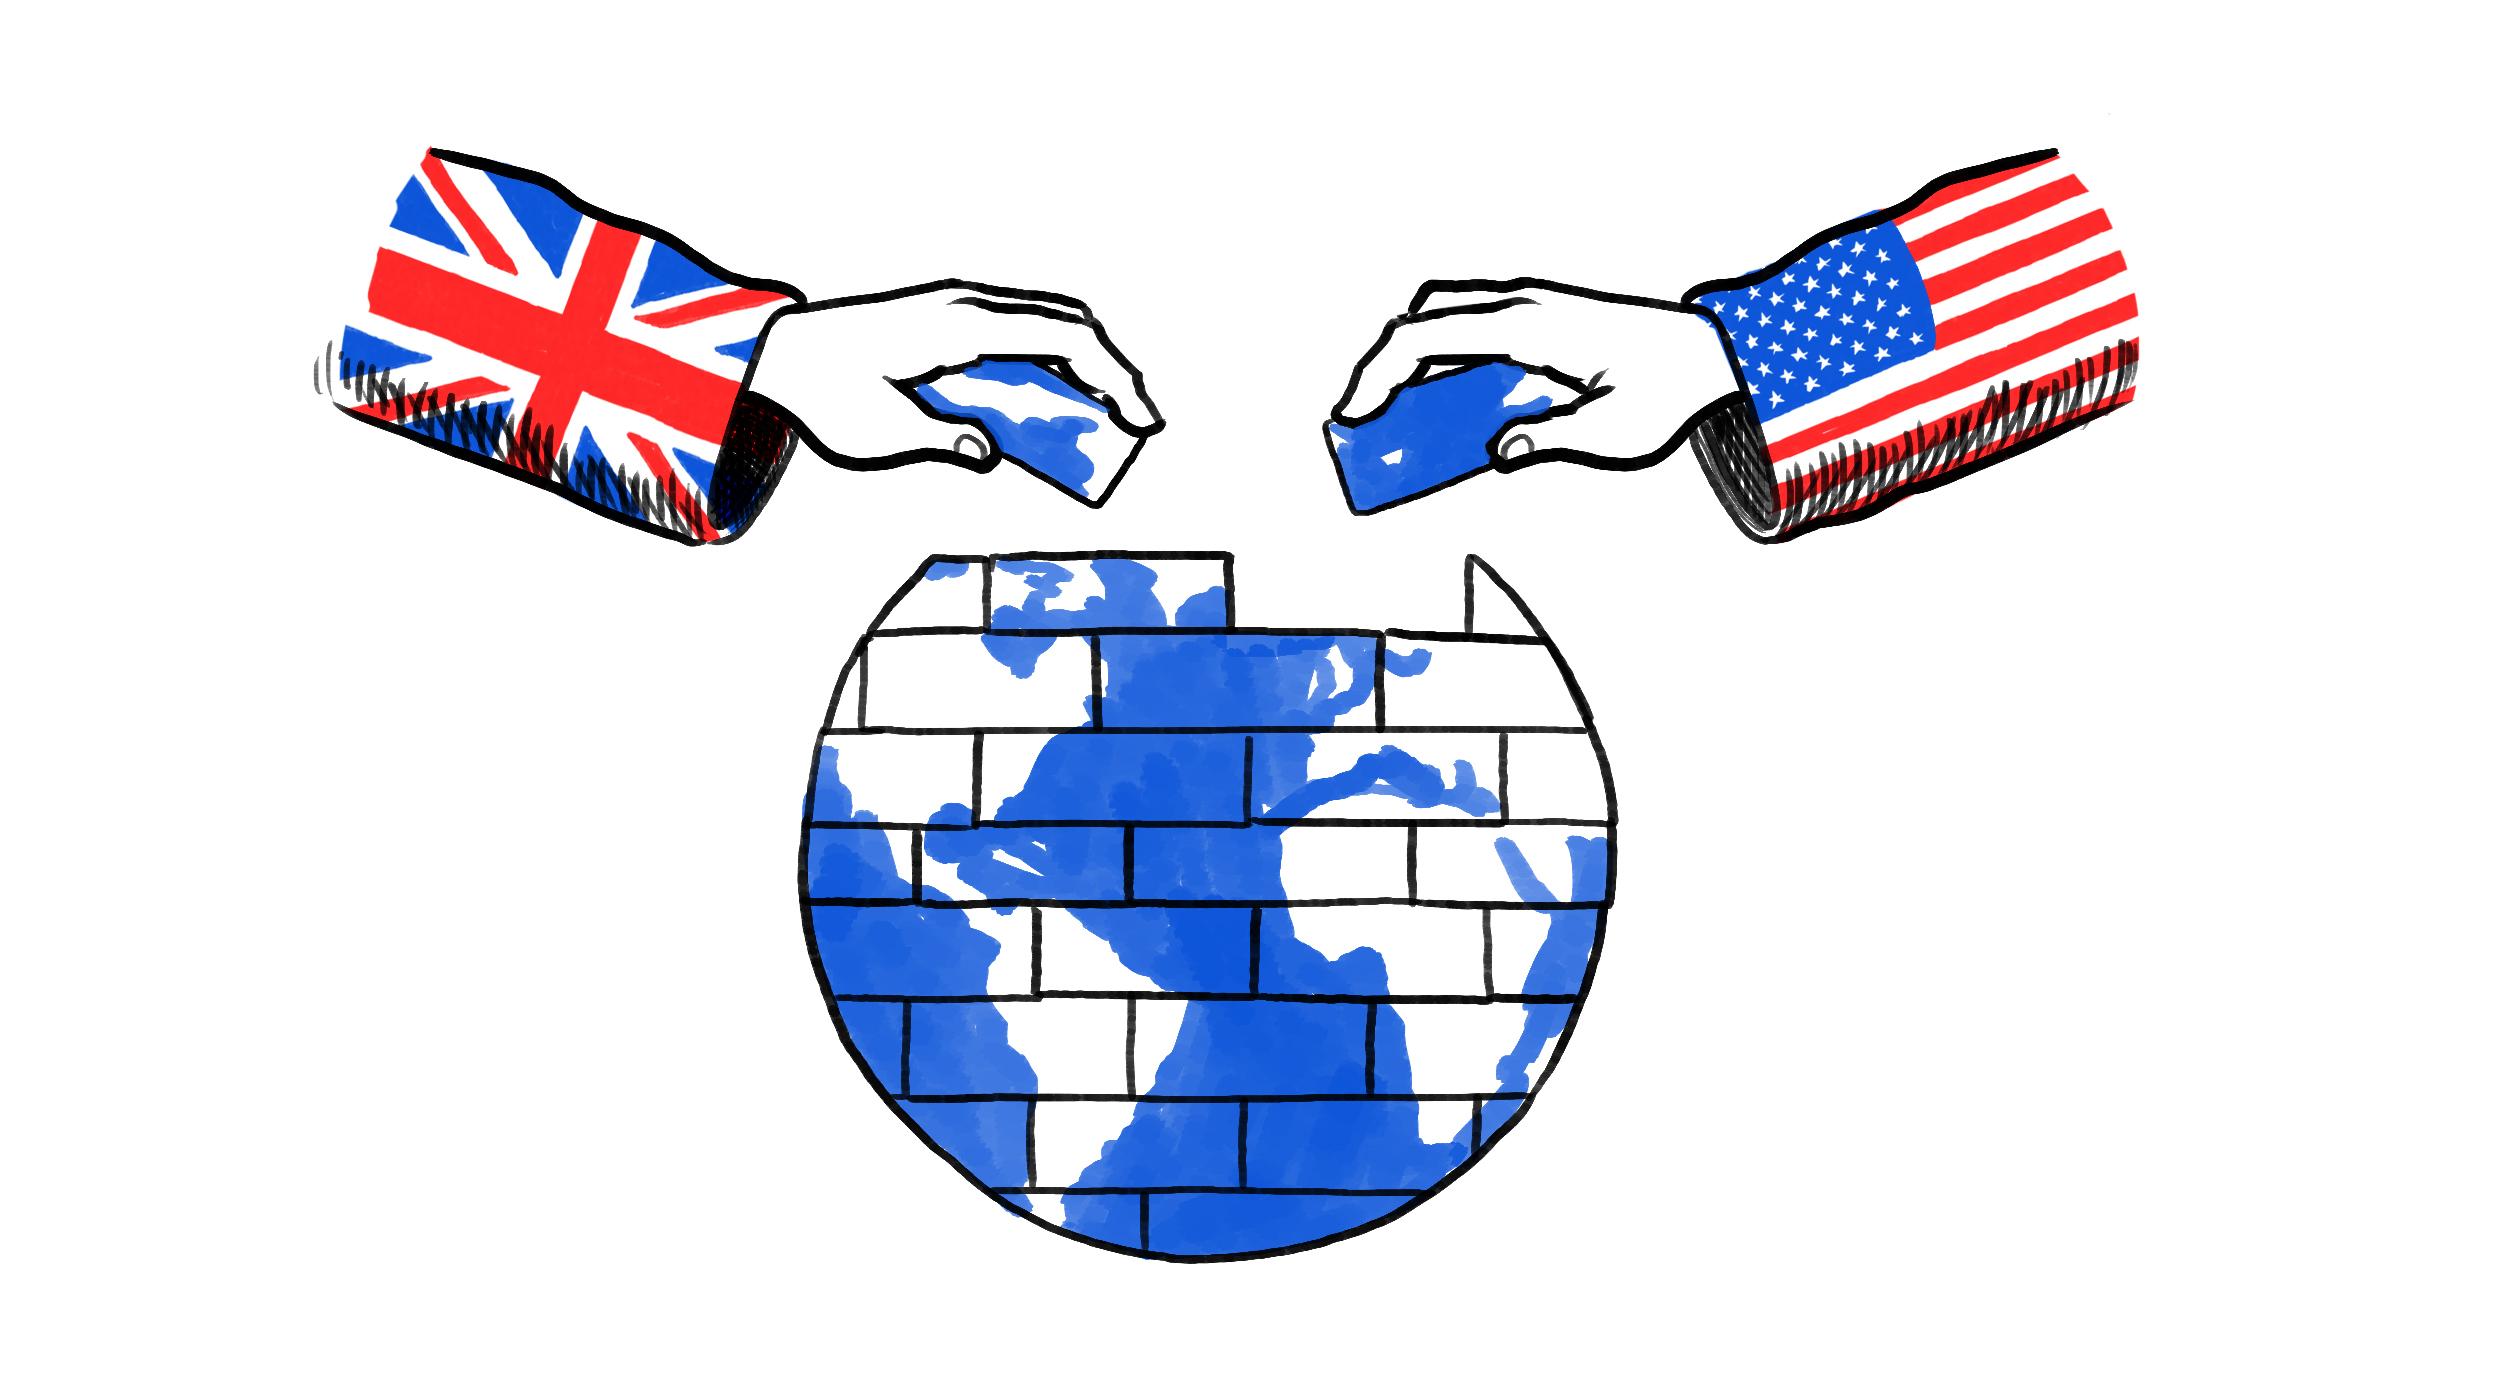 rcuk-uk-us-partnership-cognitive-08.jpg